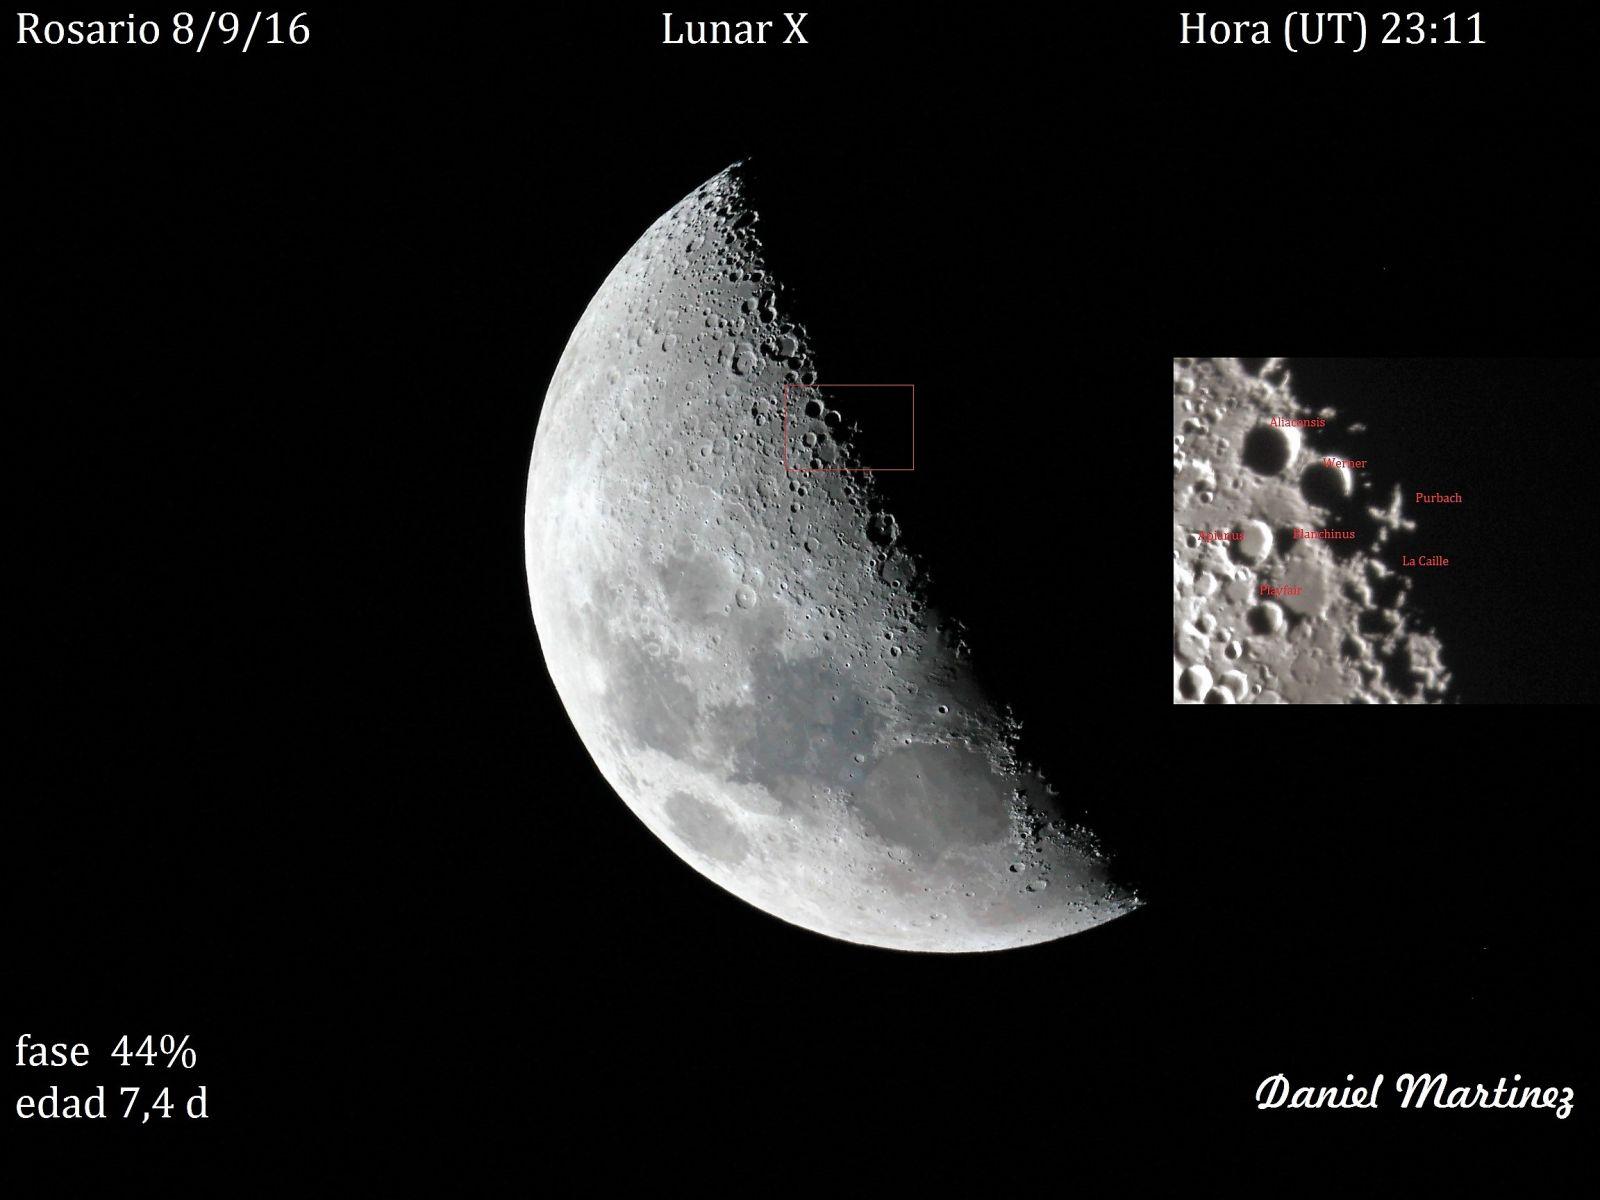 59711776c715b_LunarX.JPG